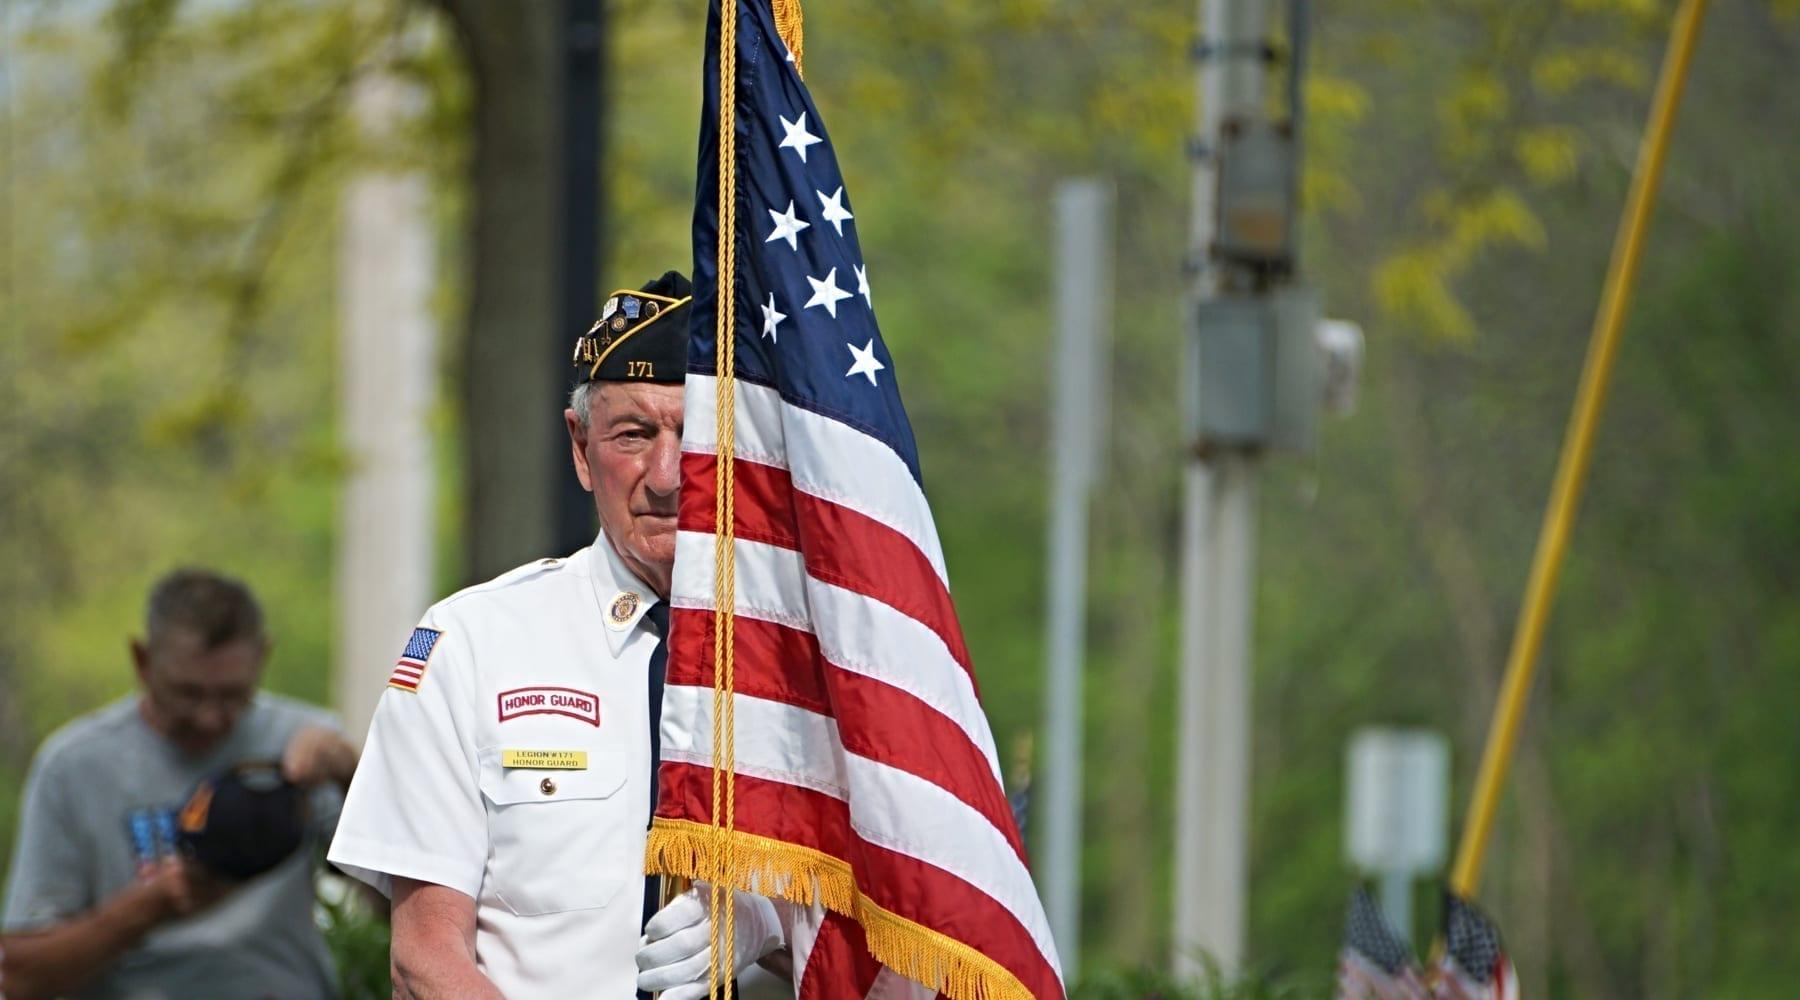 A military veteran carrying a U.S. flag